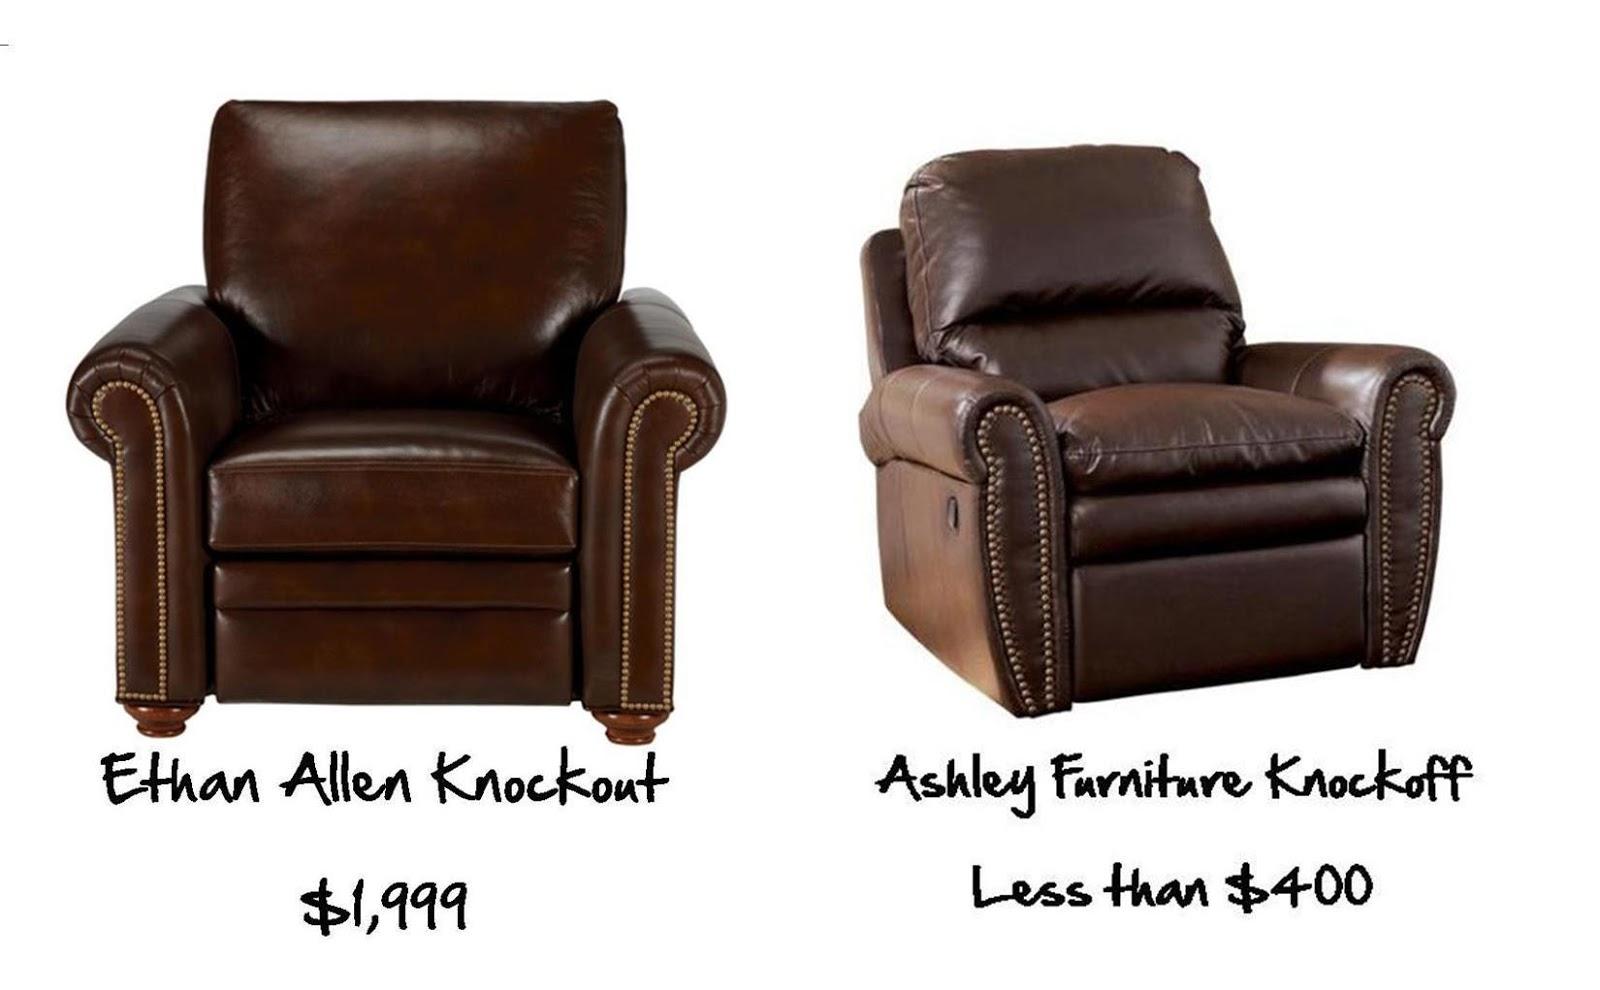 Surprising Domesticated Diva Home Sweet Home Knockout Vs Knockoff Short Links Chair Design For Home Short Linksinfo